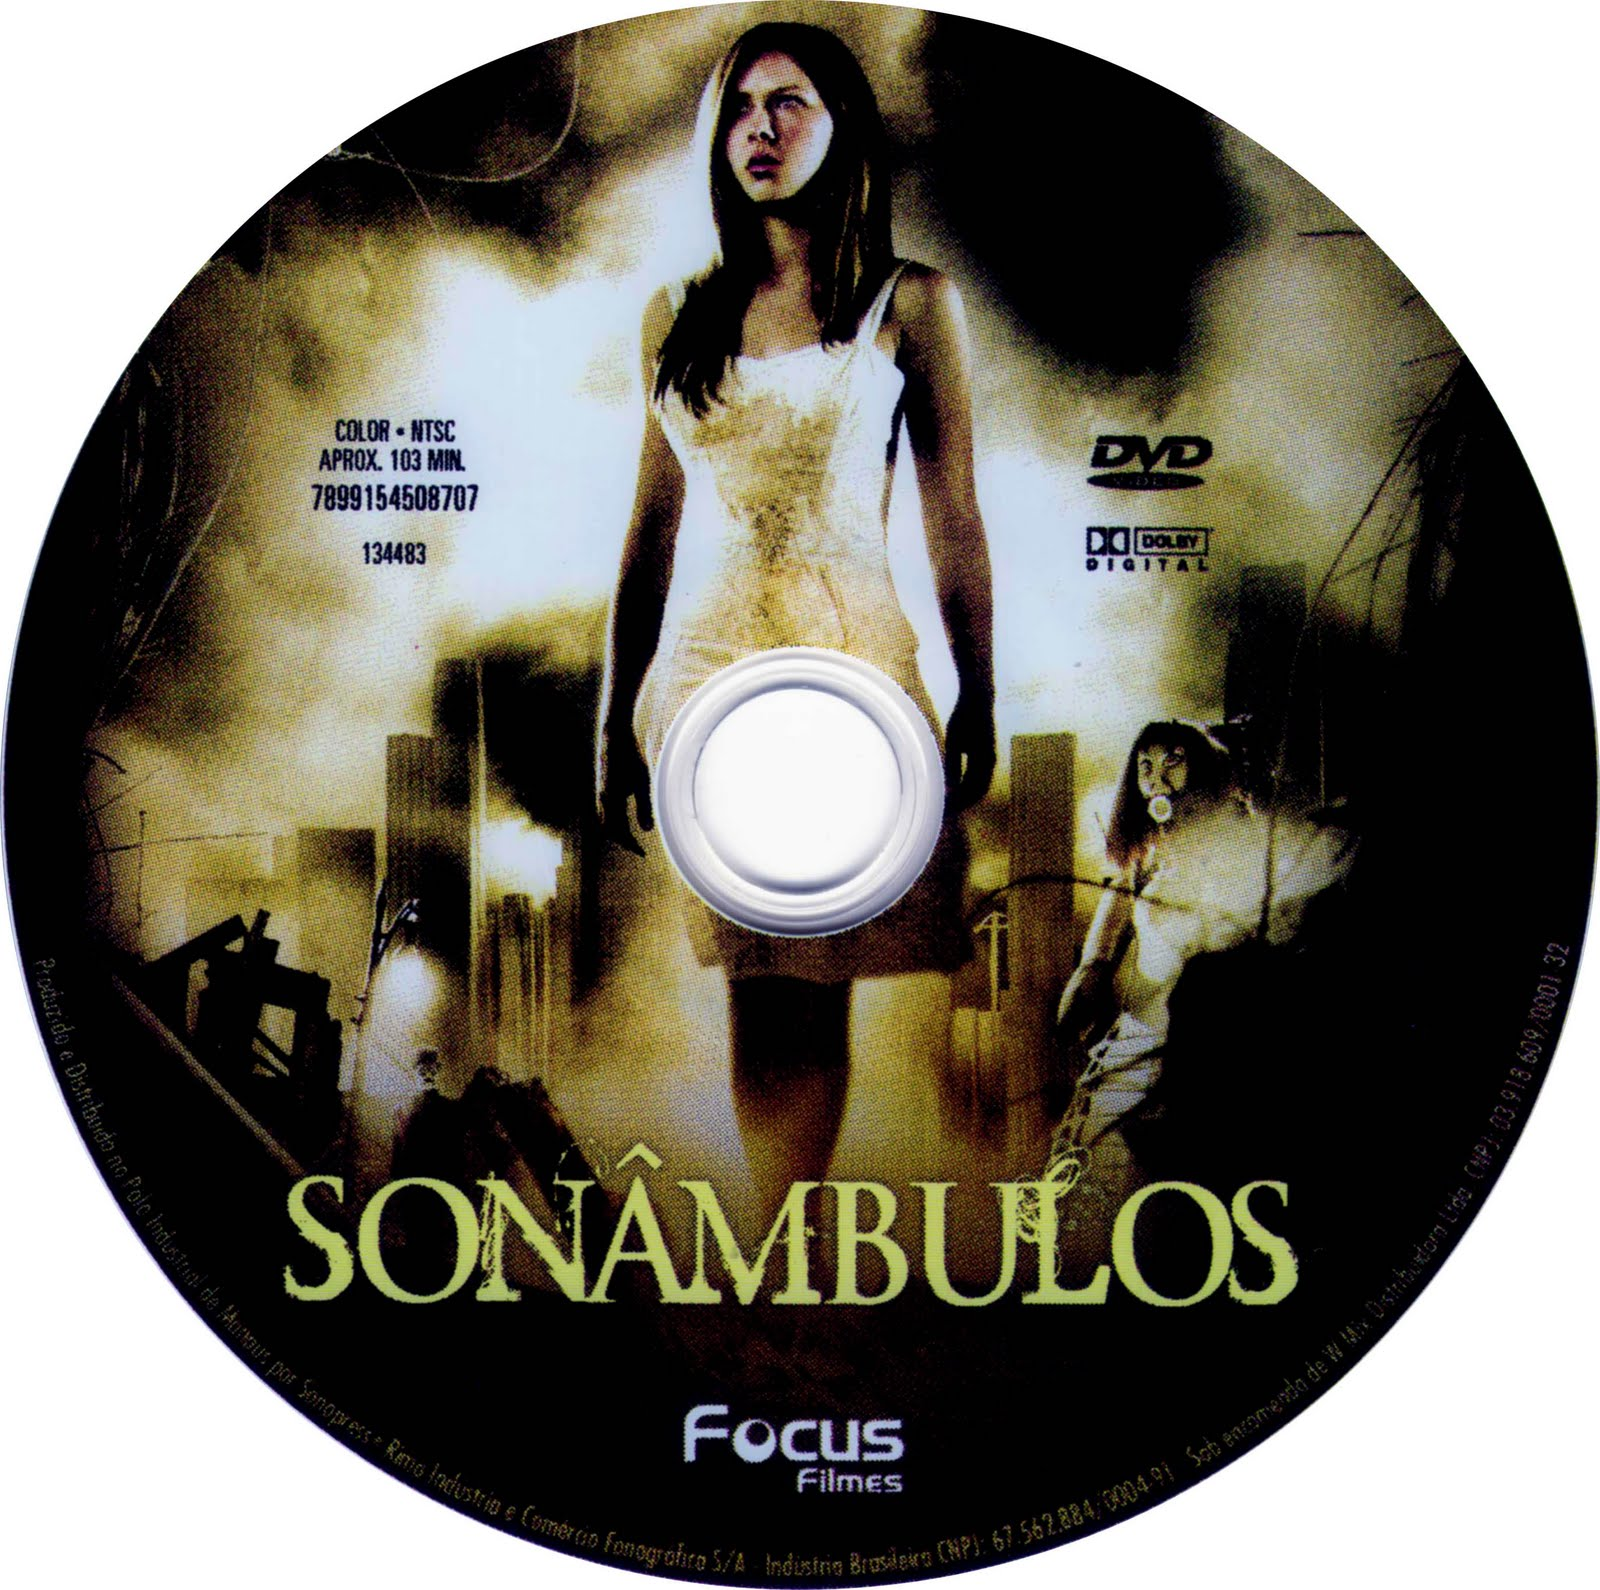 SONAMBULOS BAIXAR FILMES